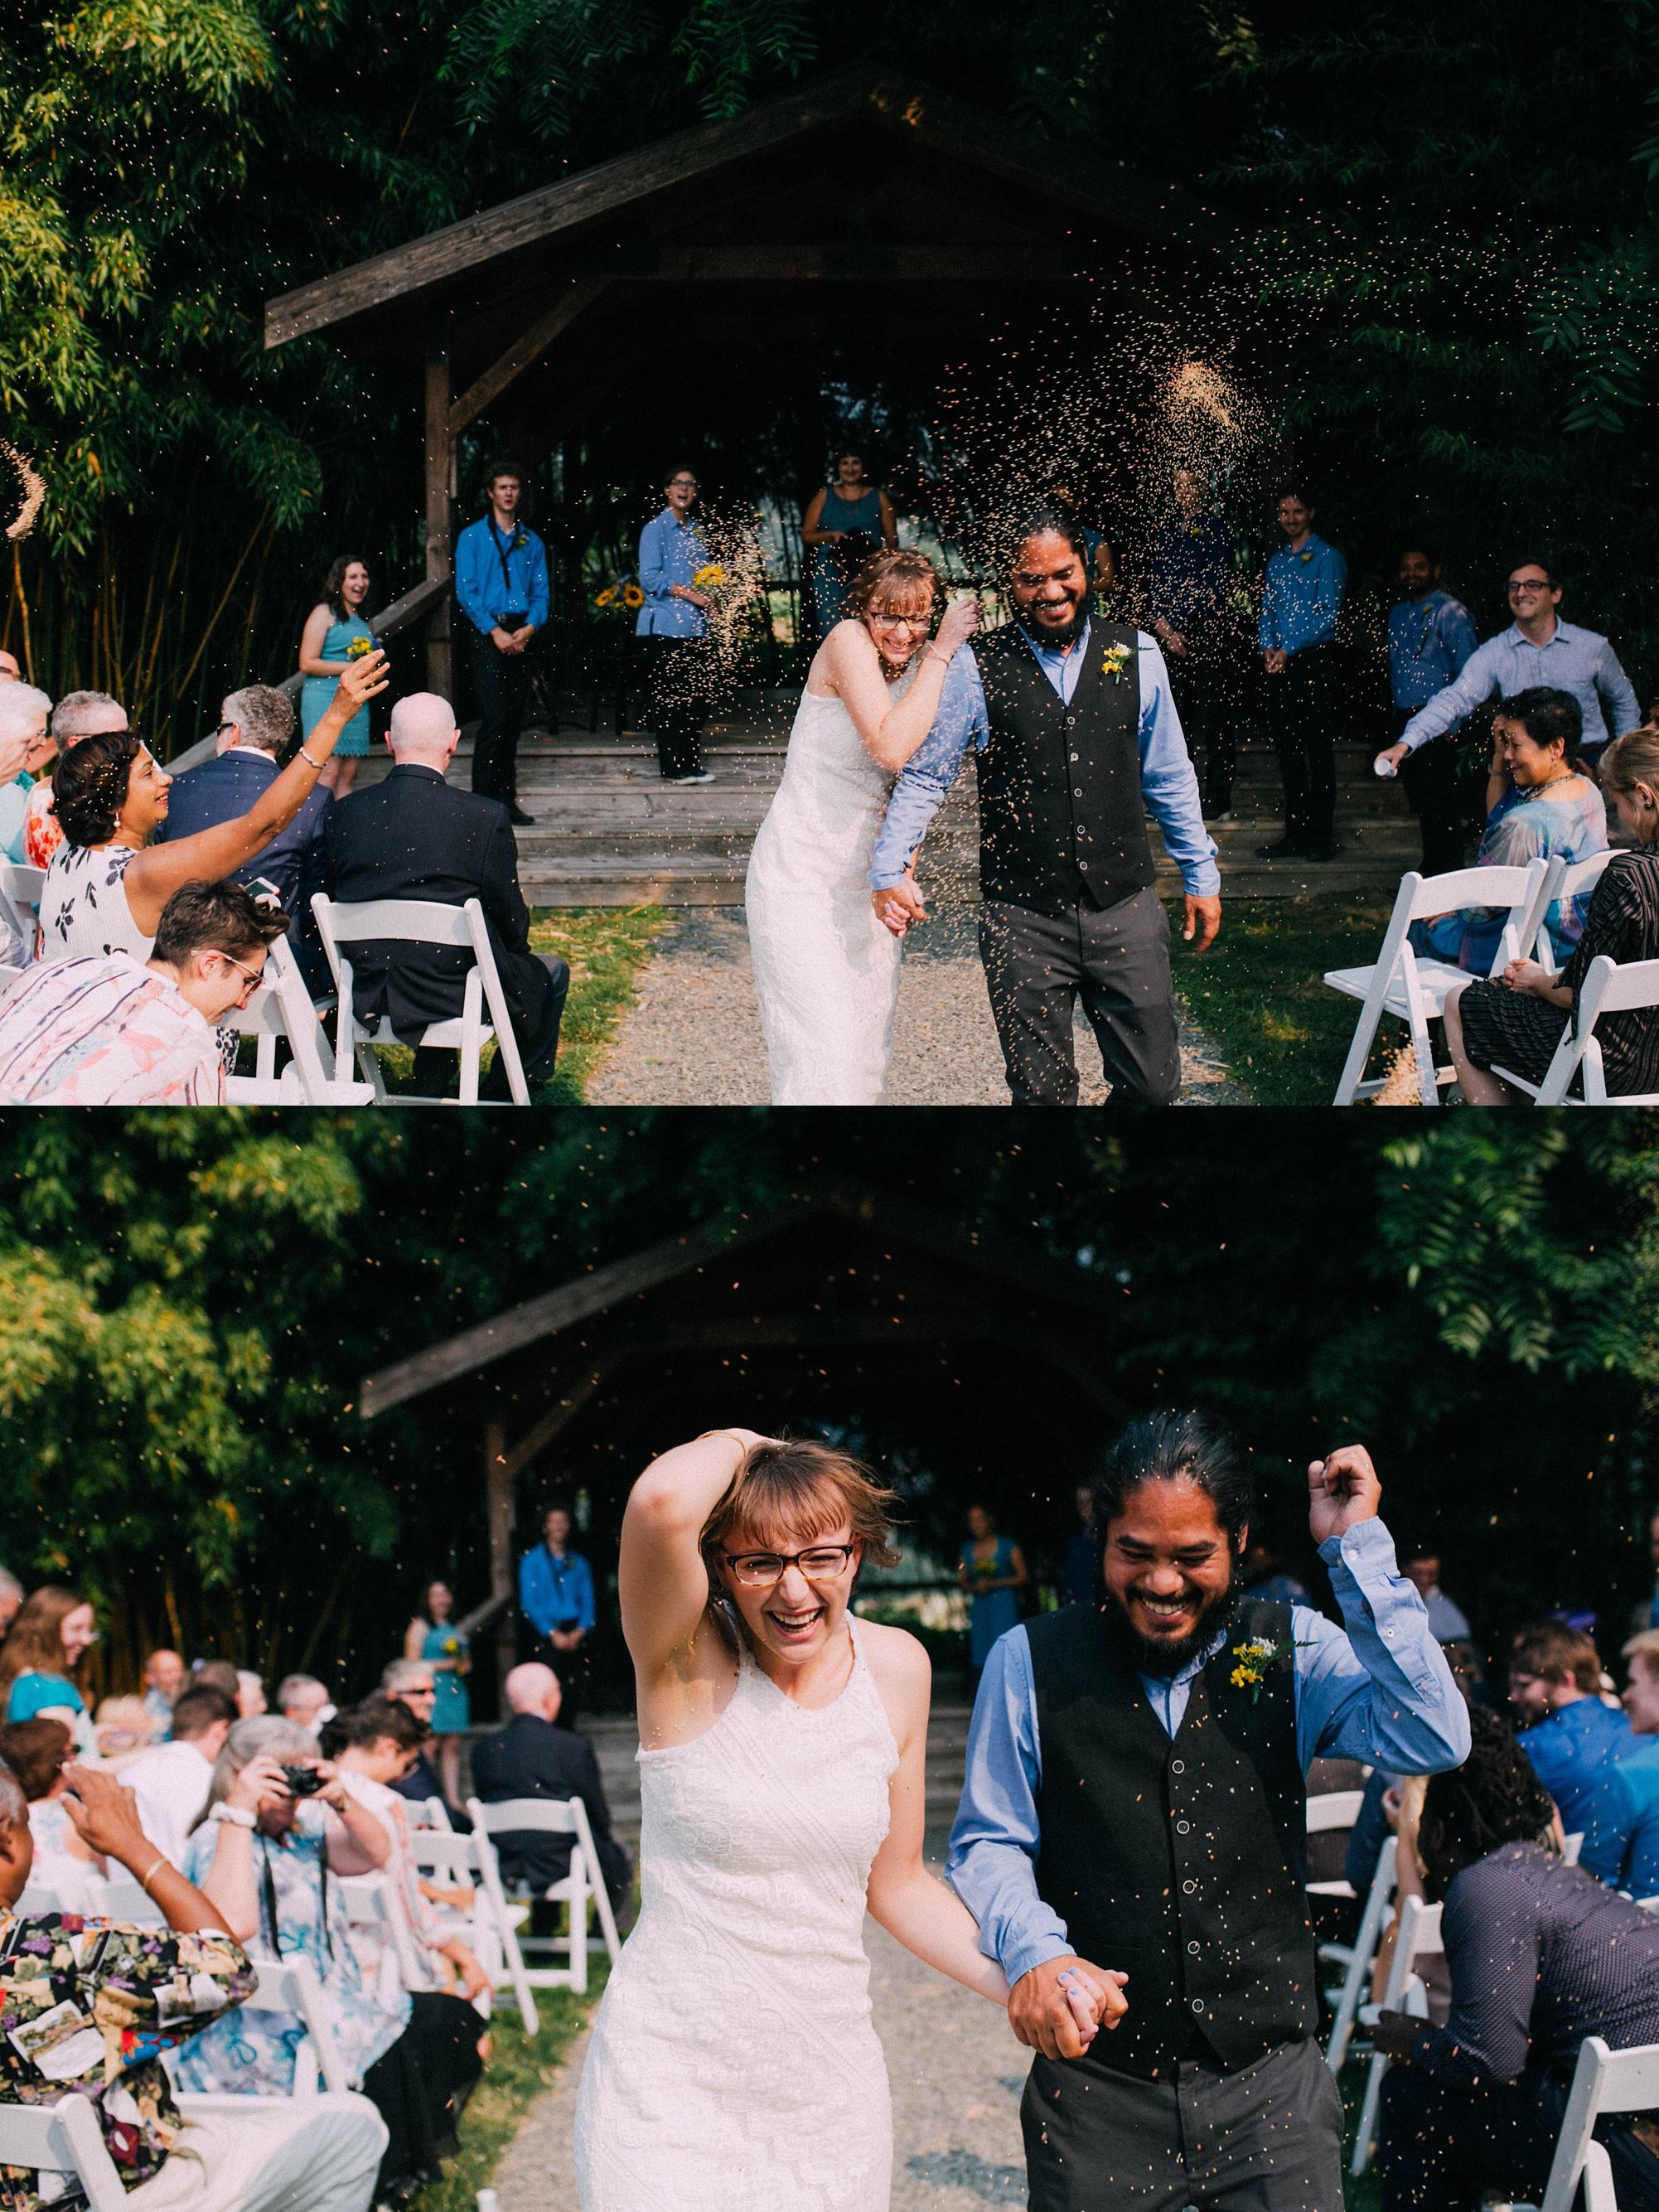 ashley_vos_seattle_ wedding_photographer_0466.jpg